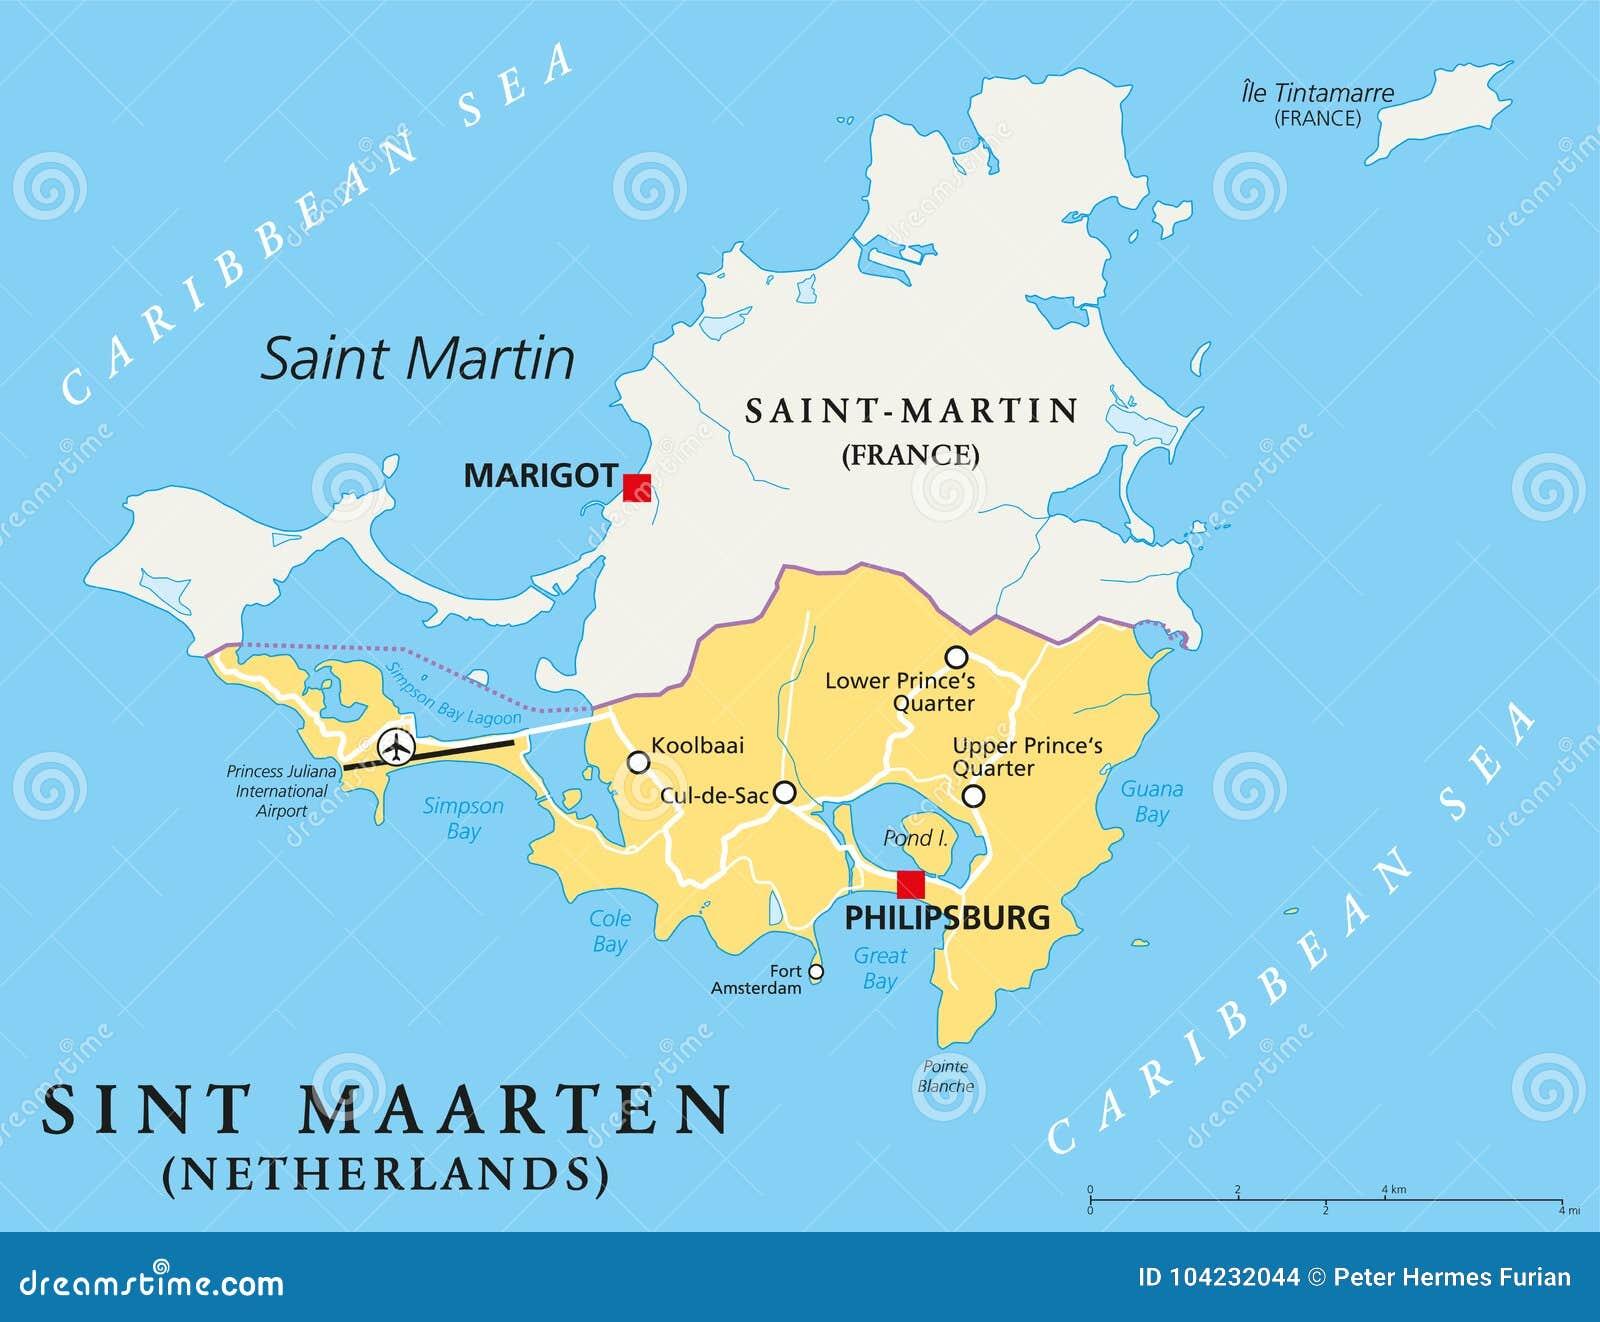 Sint Maarten Political Map stock vector. Illustration of cruise ...